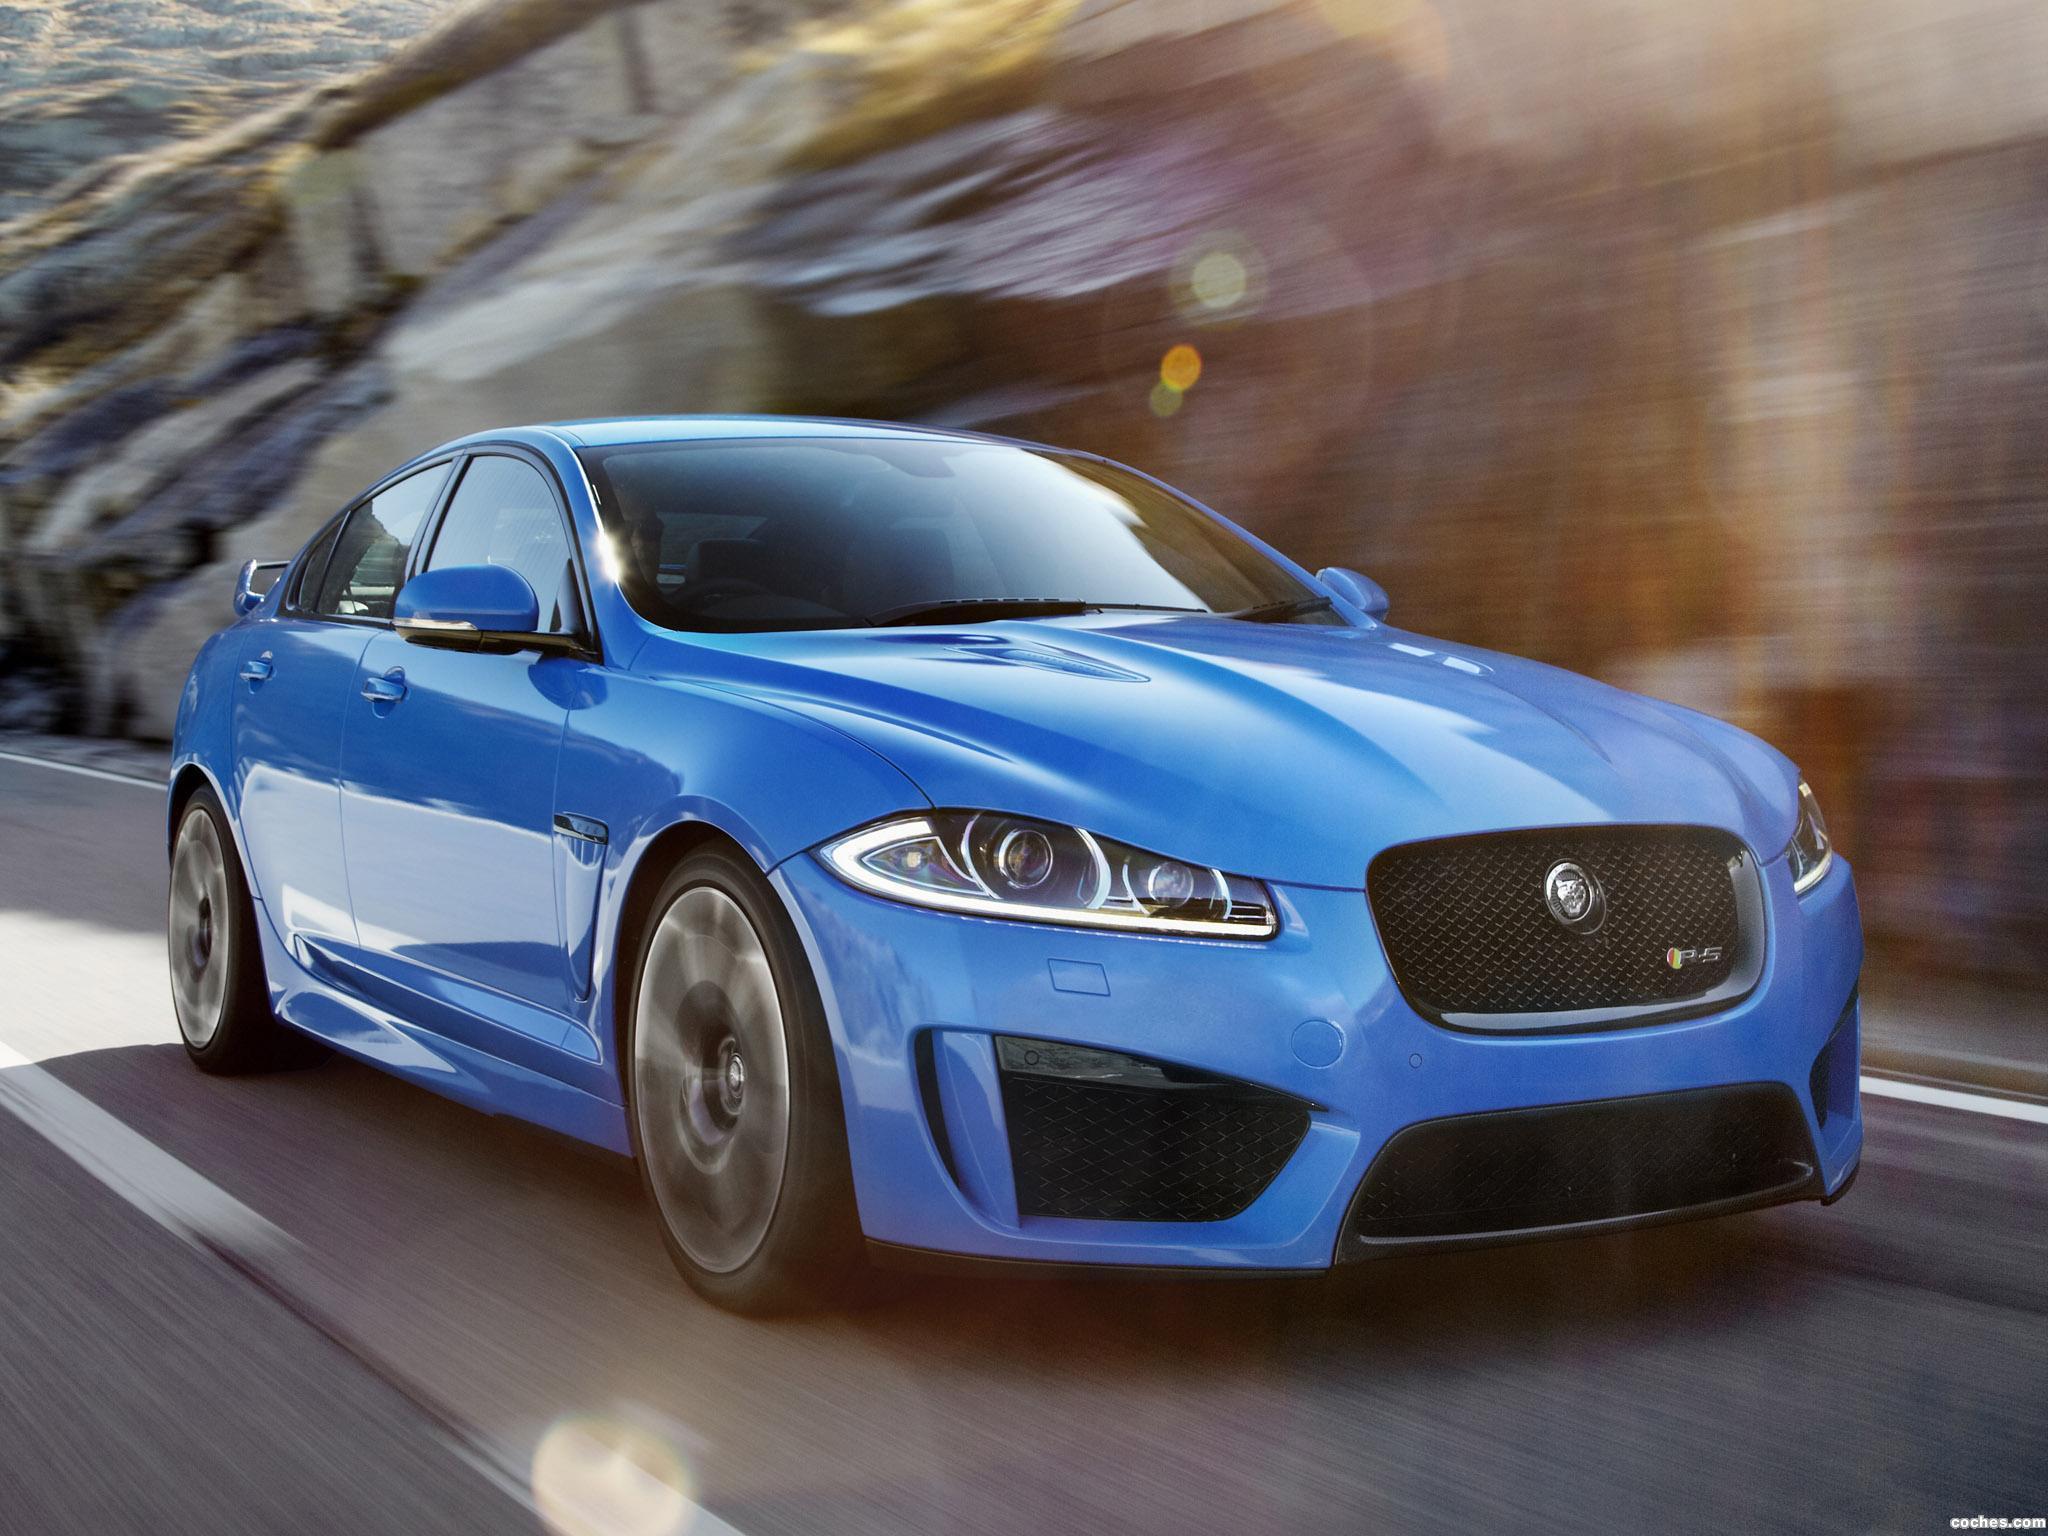 Fotos de Jaguar XFR-S UK 2013 | 2048 x 1536 jpeg 326kB